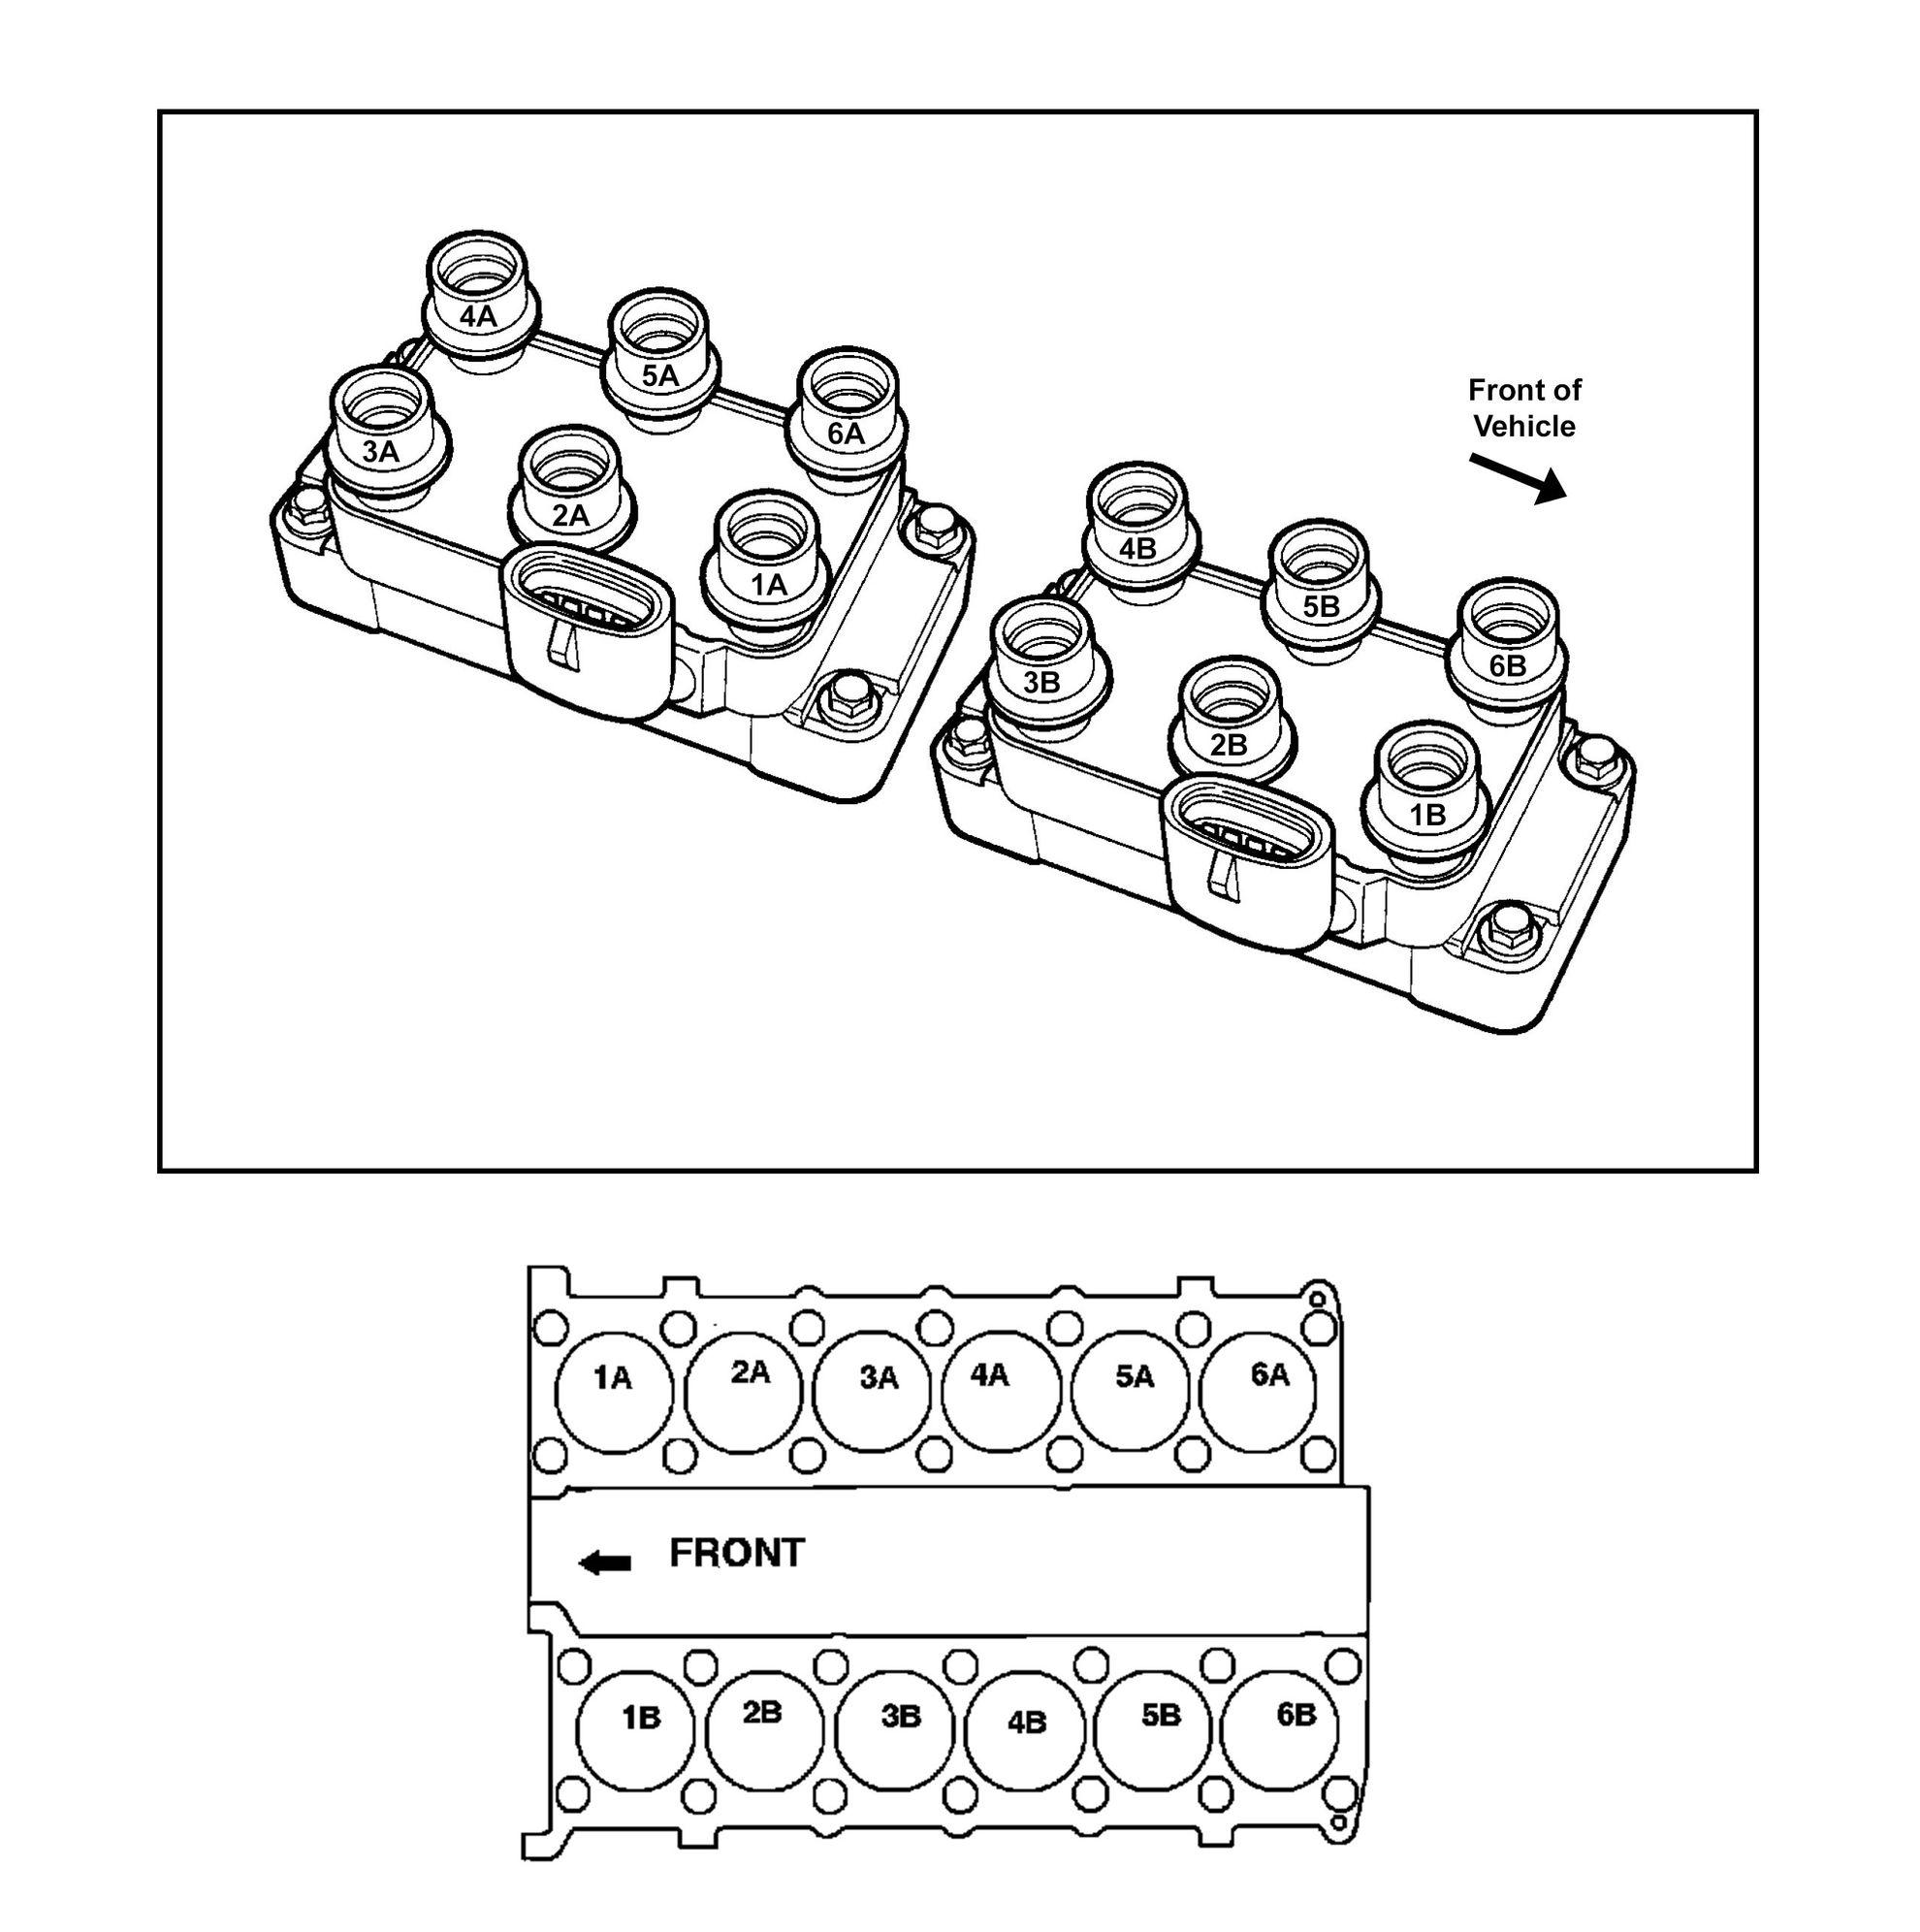 2000 ford explorer spark plug diagram polaris wiring sportsman 500 f 150 coil pack fuse box